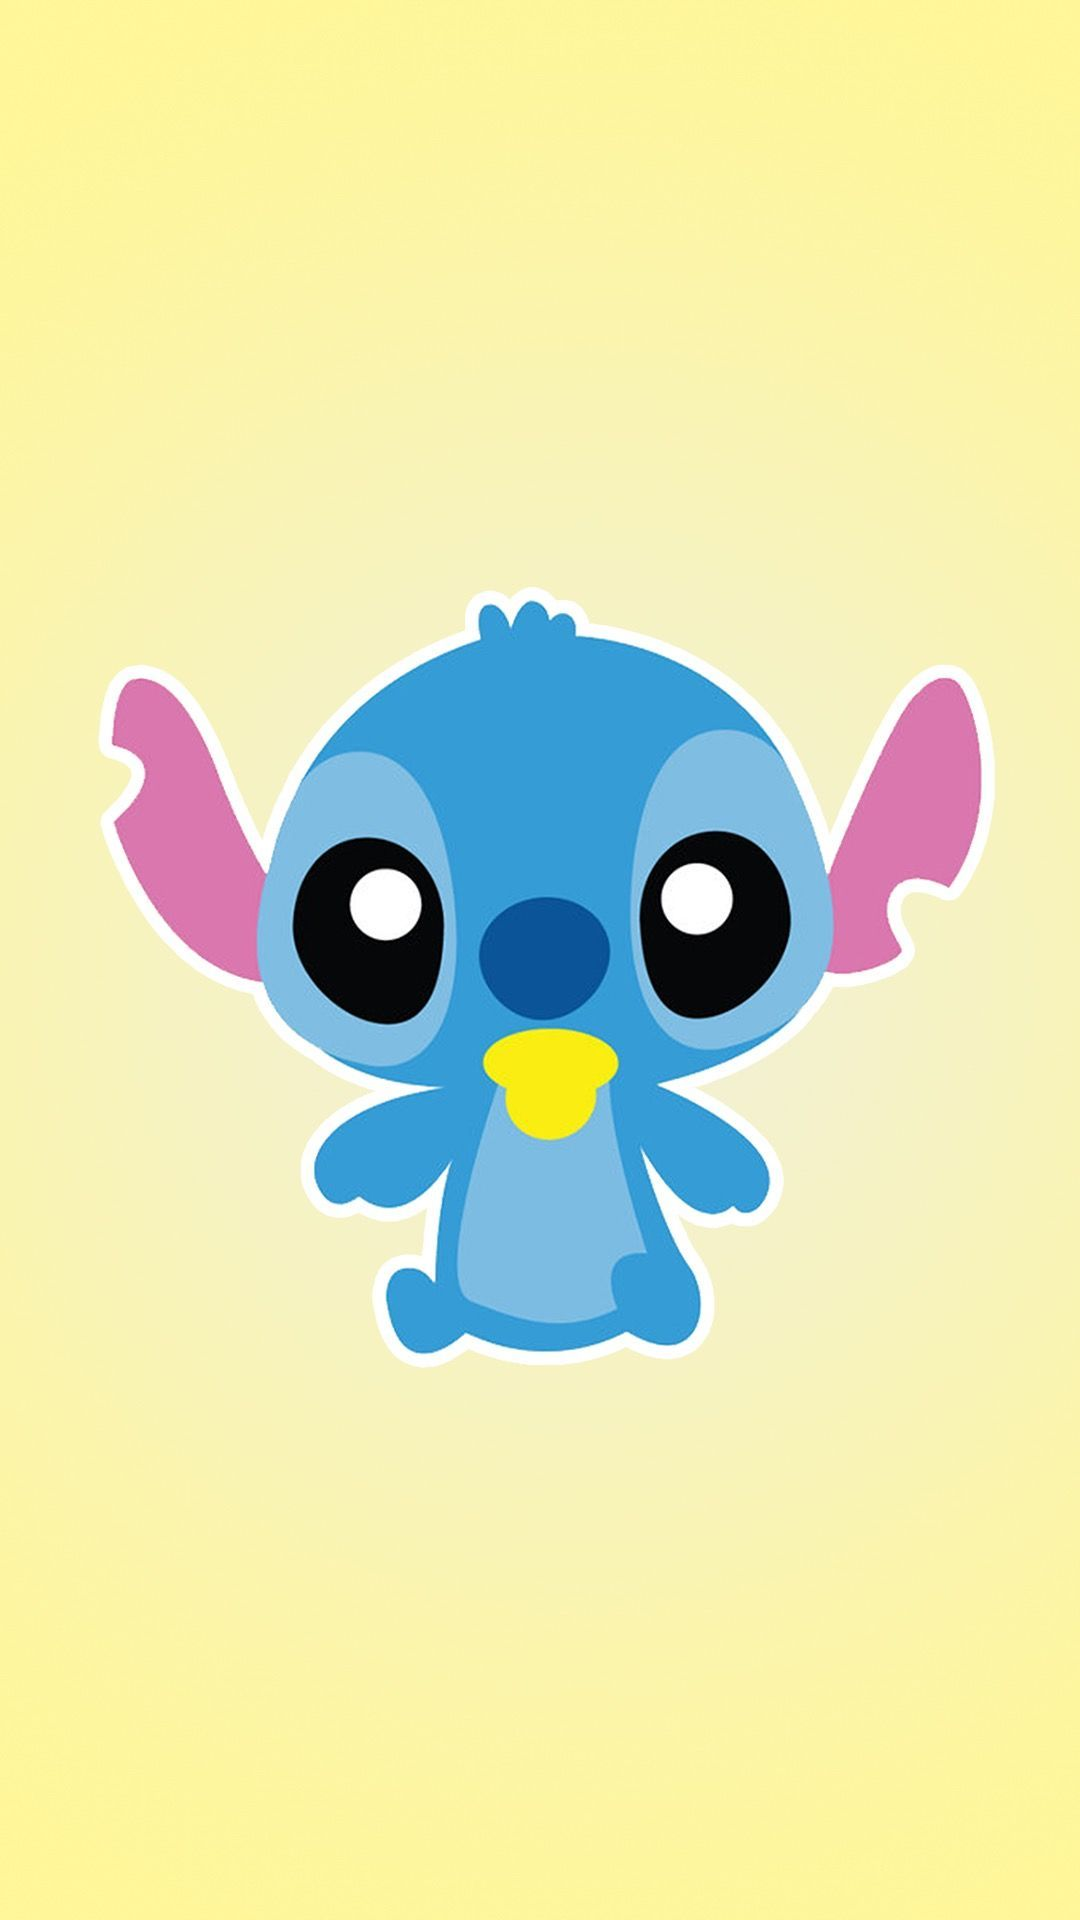 Angel Cute Iphone Wallpaper Disney Stitch